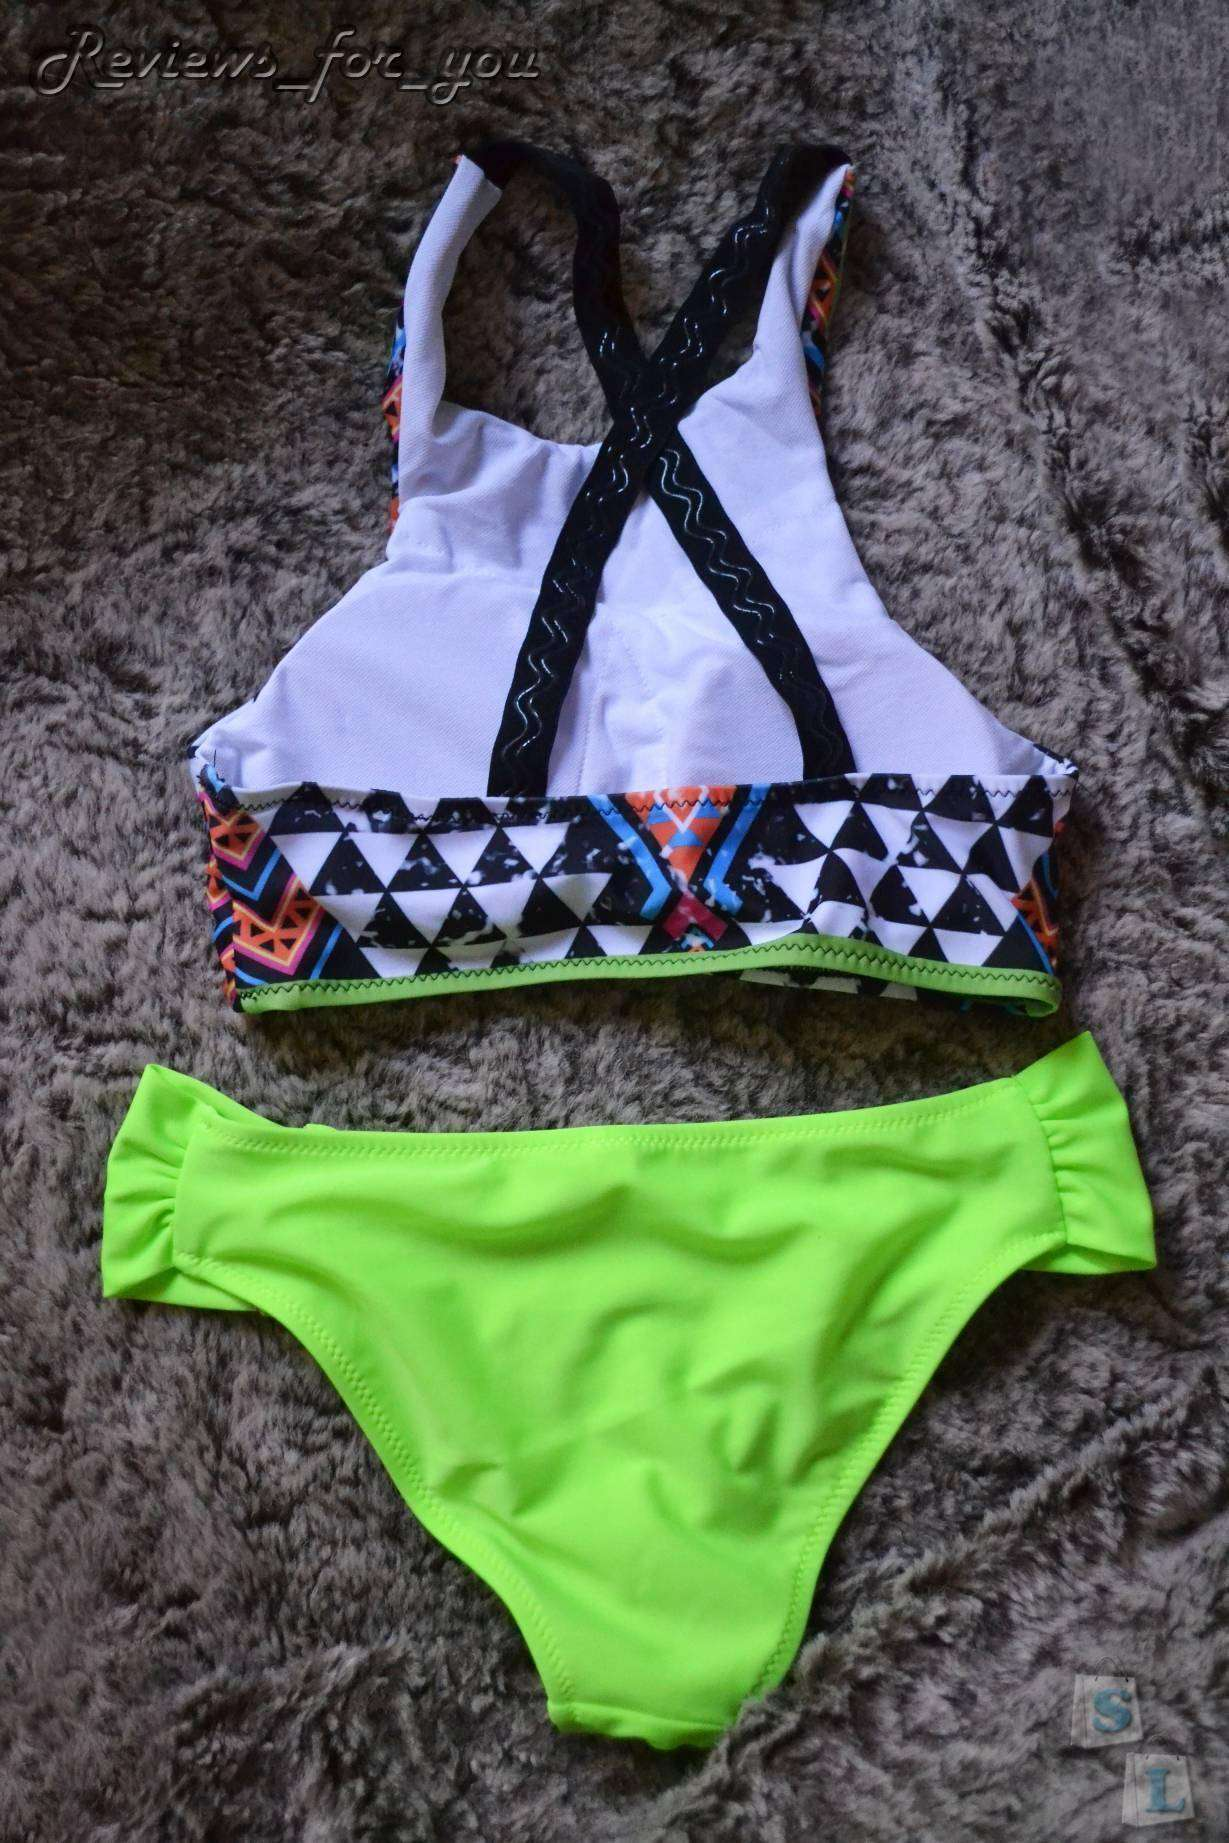 Aliexpress: Яркий купальник бикини, пора готовиться к лету